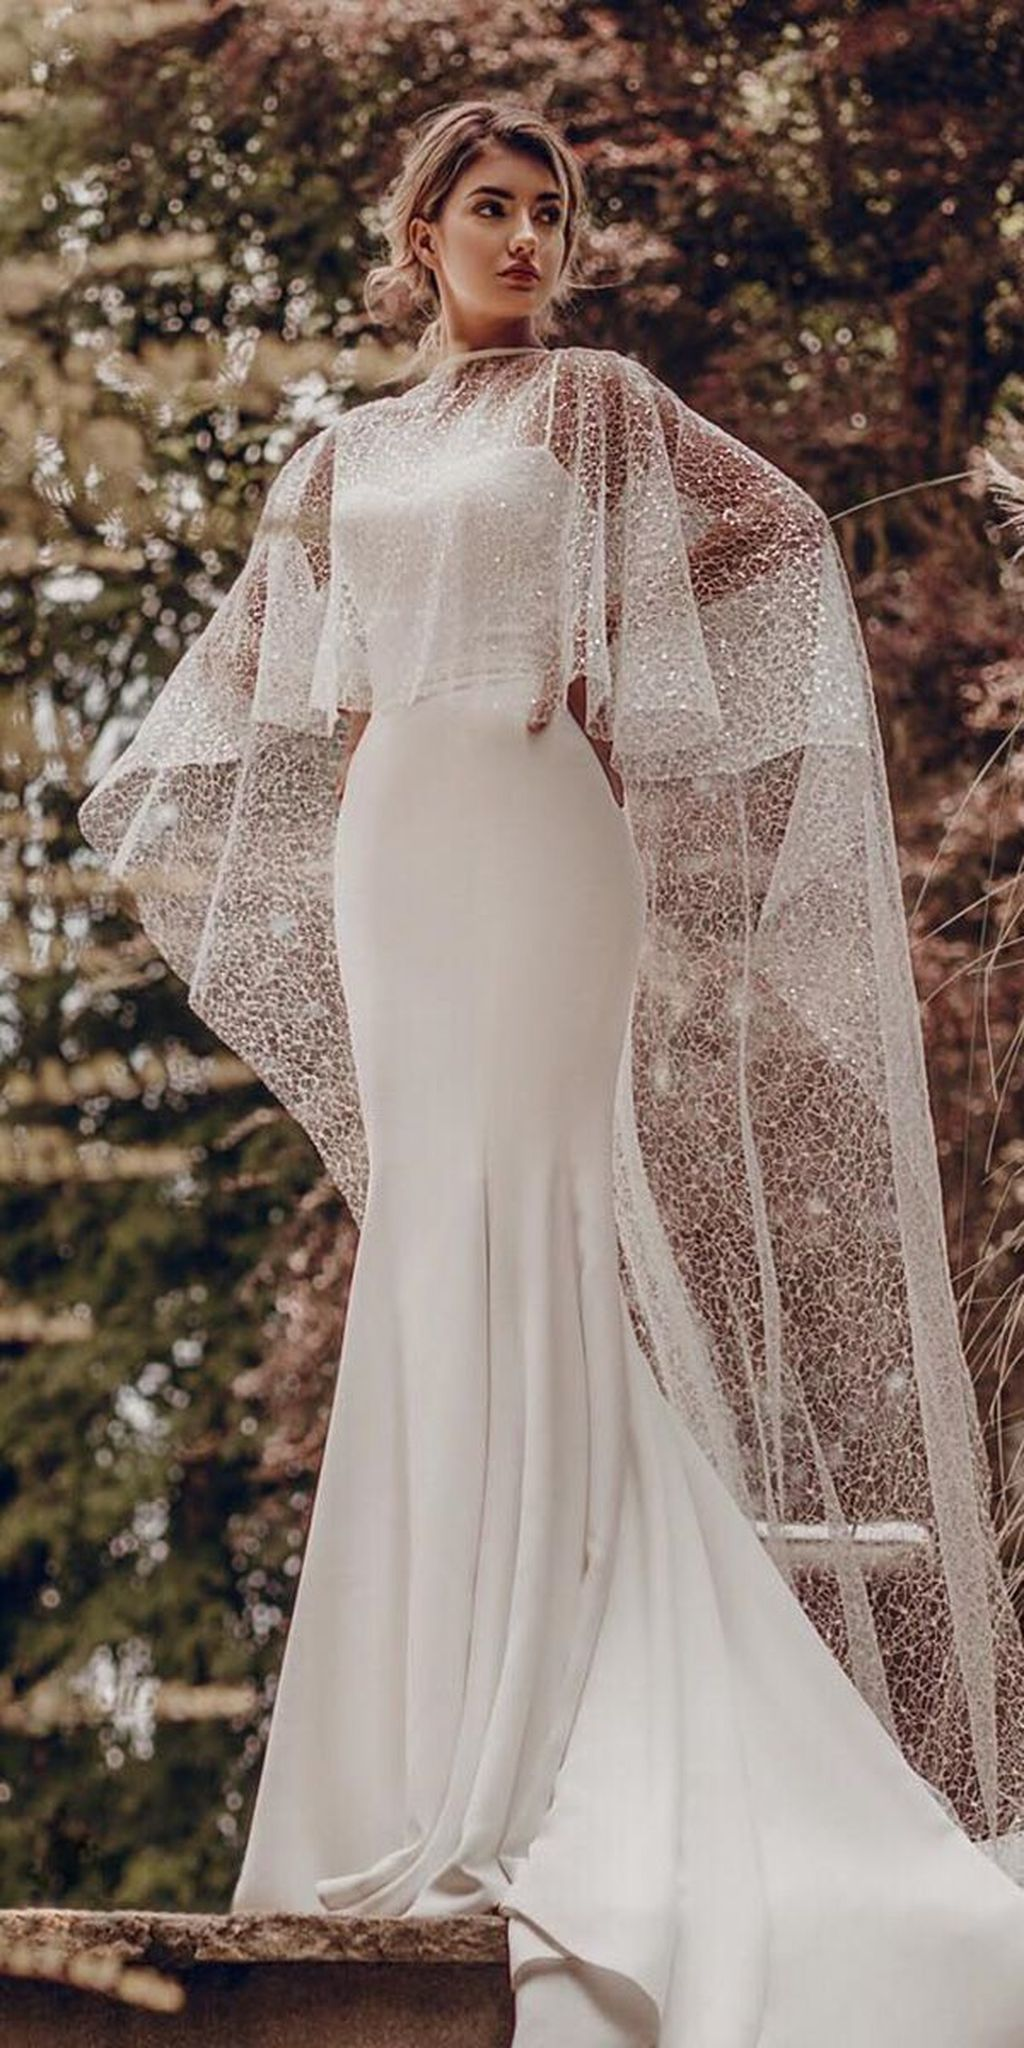 38 Perfect Winter Wedding Dresses That Will Make You Look Beautiful Wedding Dress Long Sleeve Winter Wedding Dress Wedding Dress Guide [ 2048 x 1024 Pixel ]